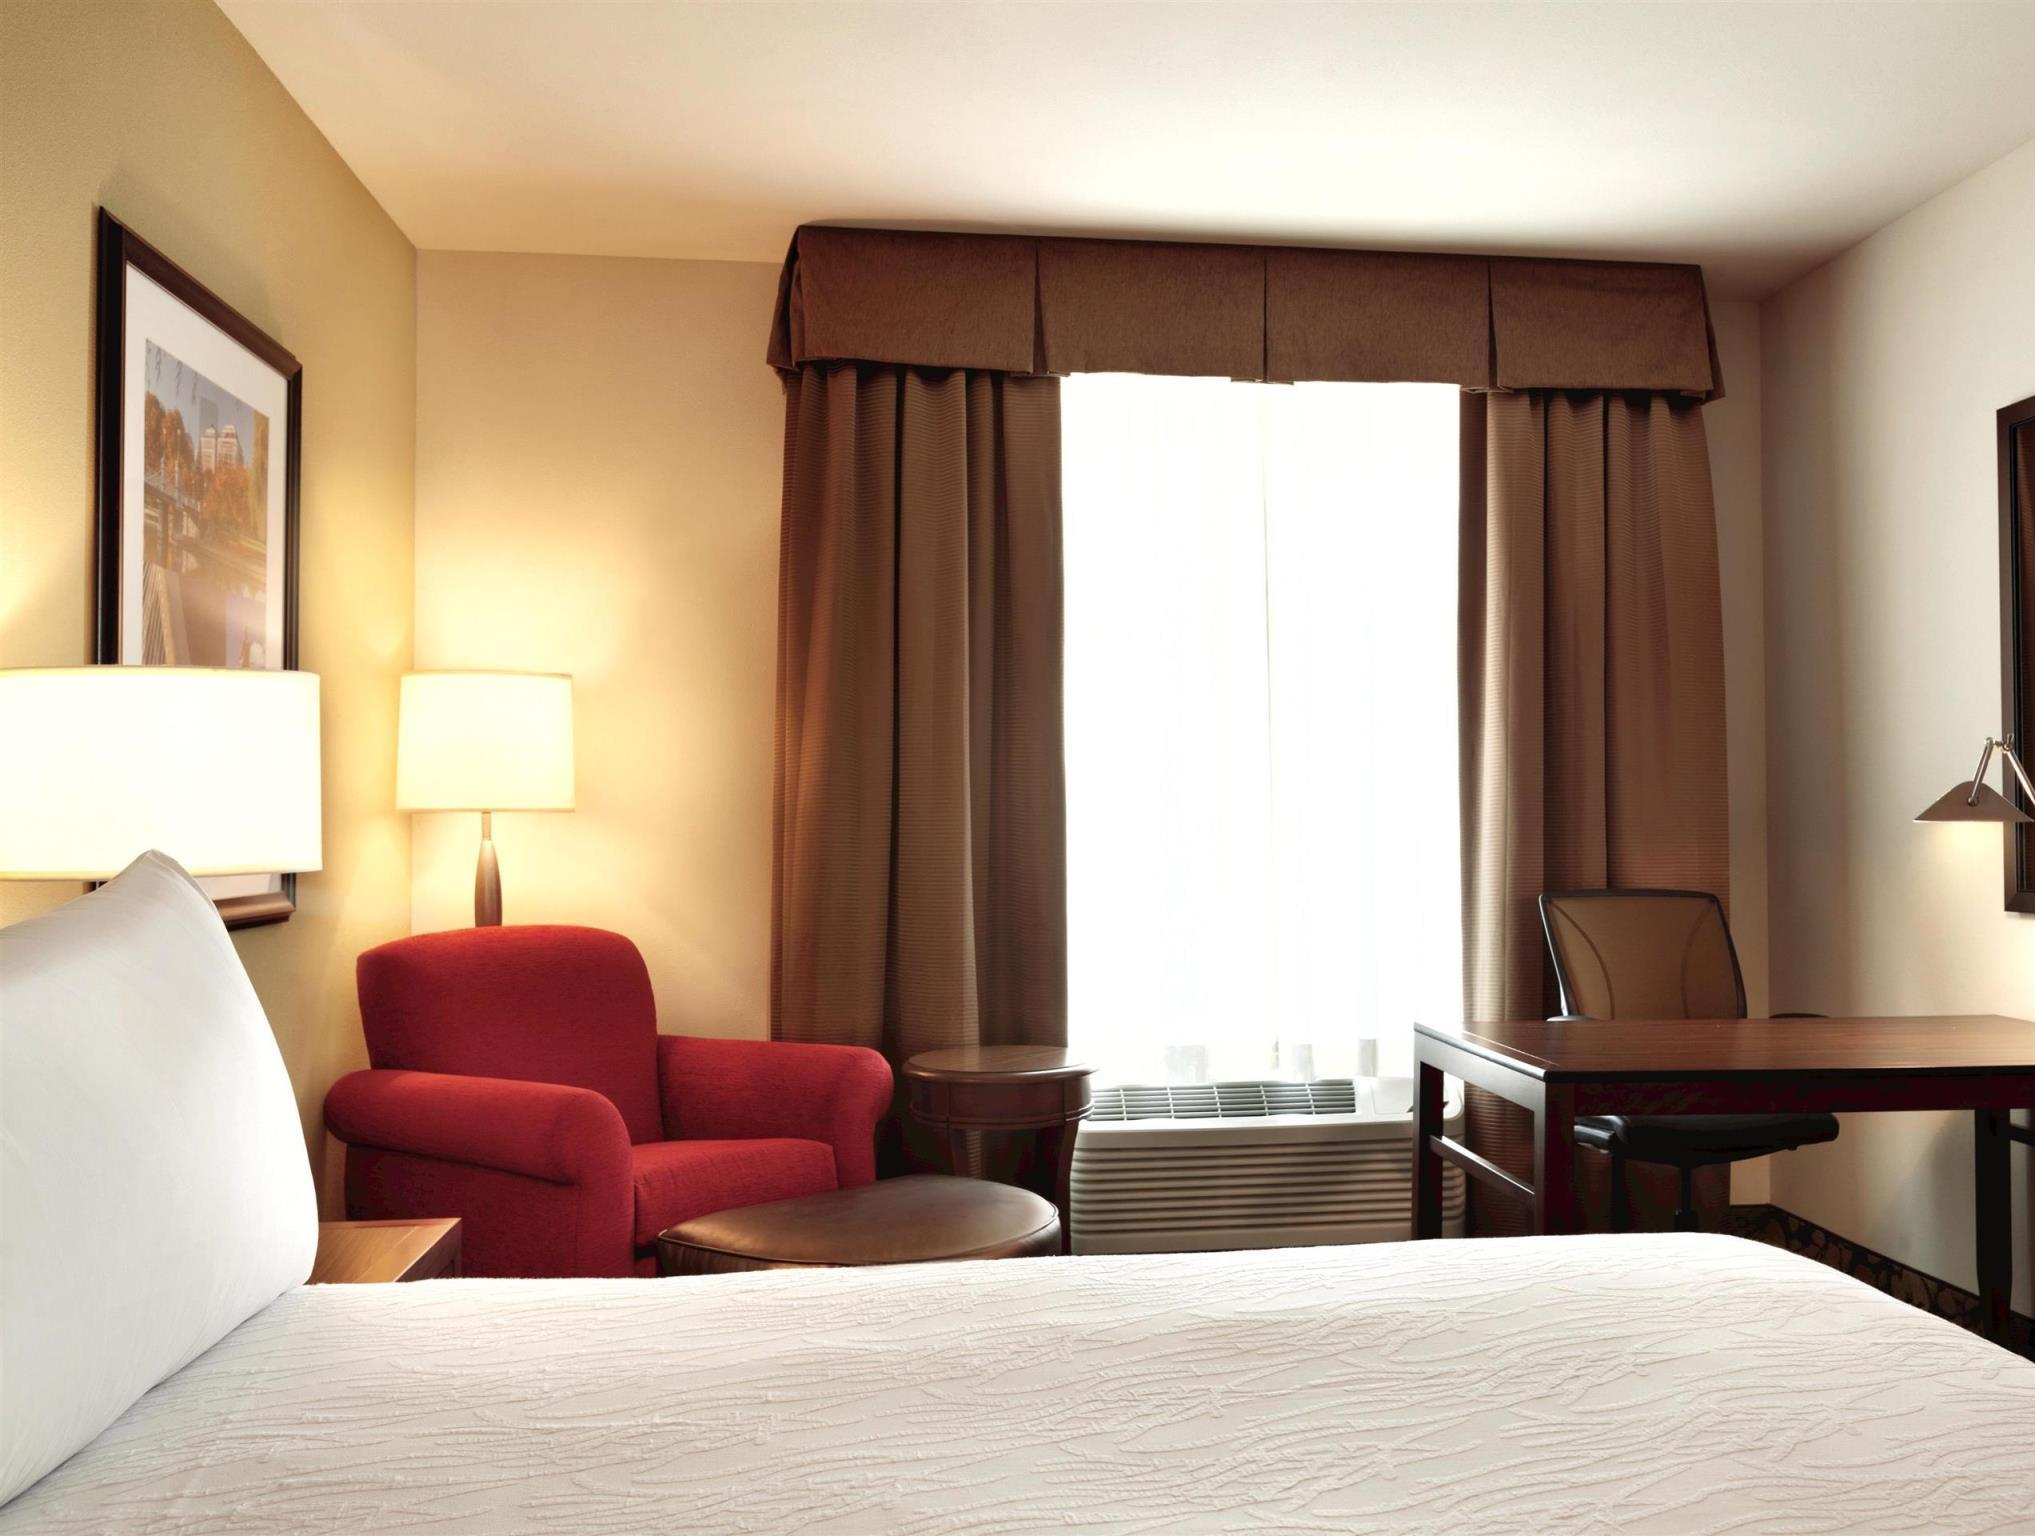 hotel img - Hilton Garden Inn Boston Logan Airport